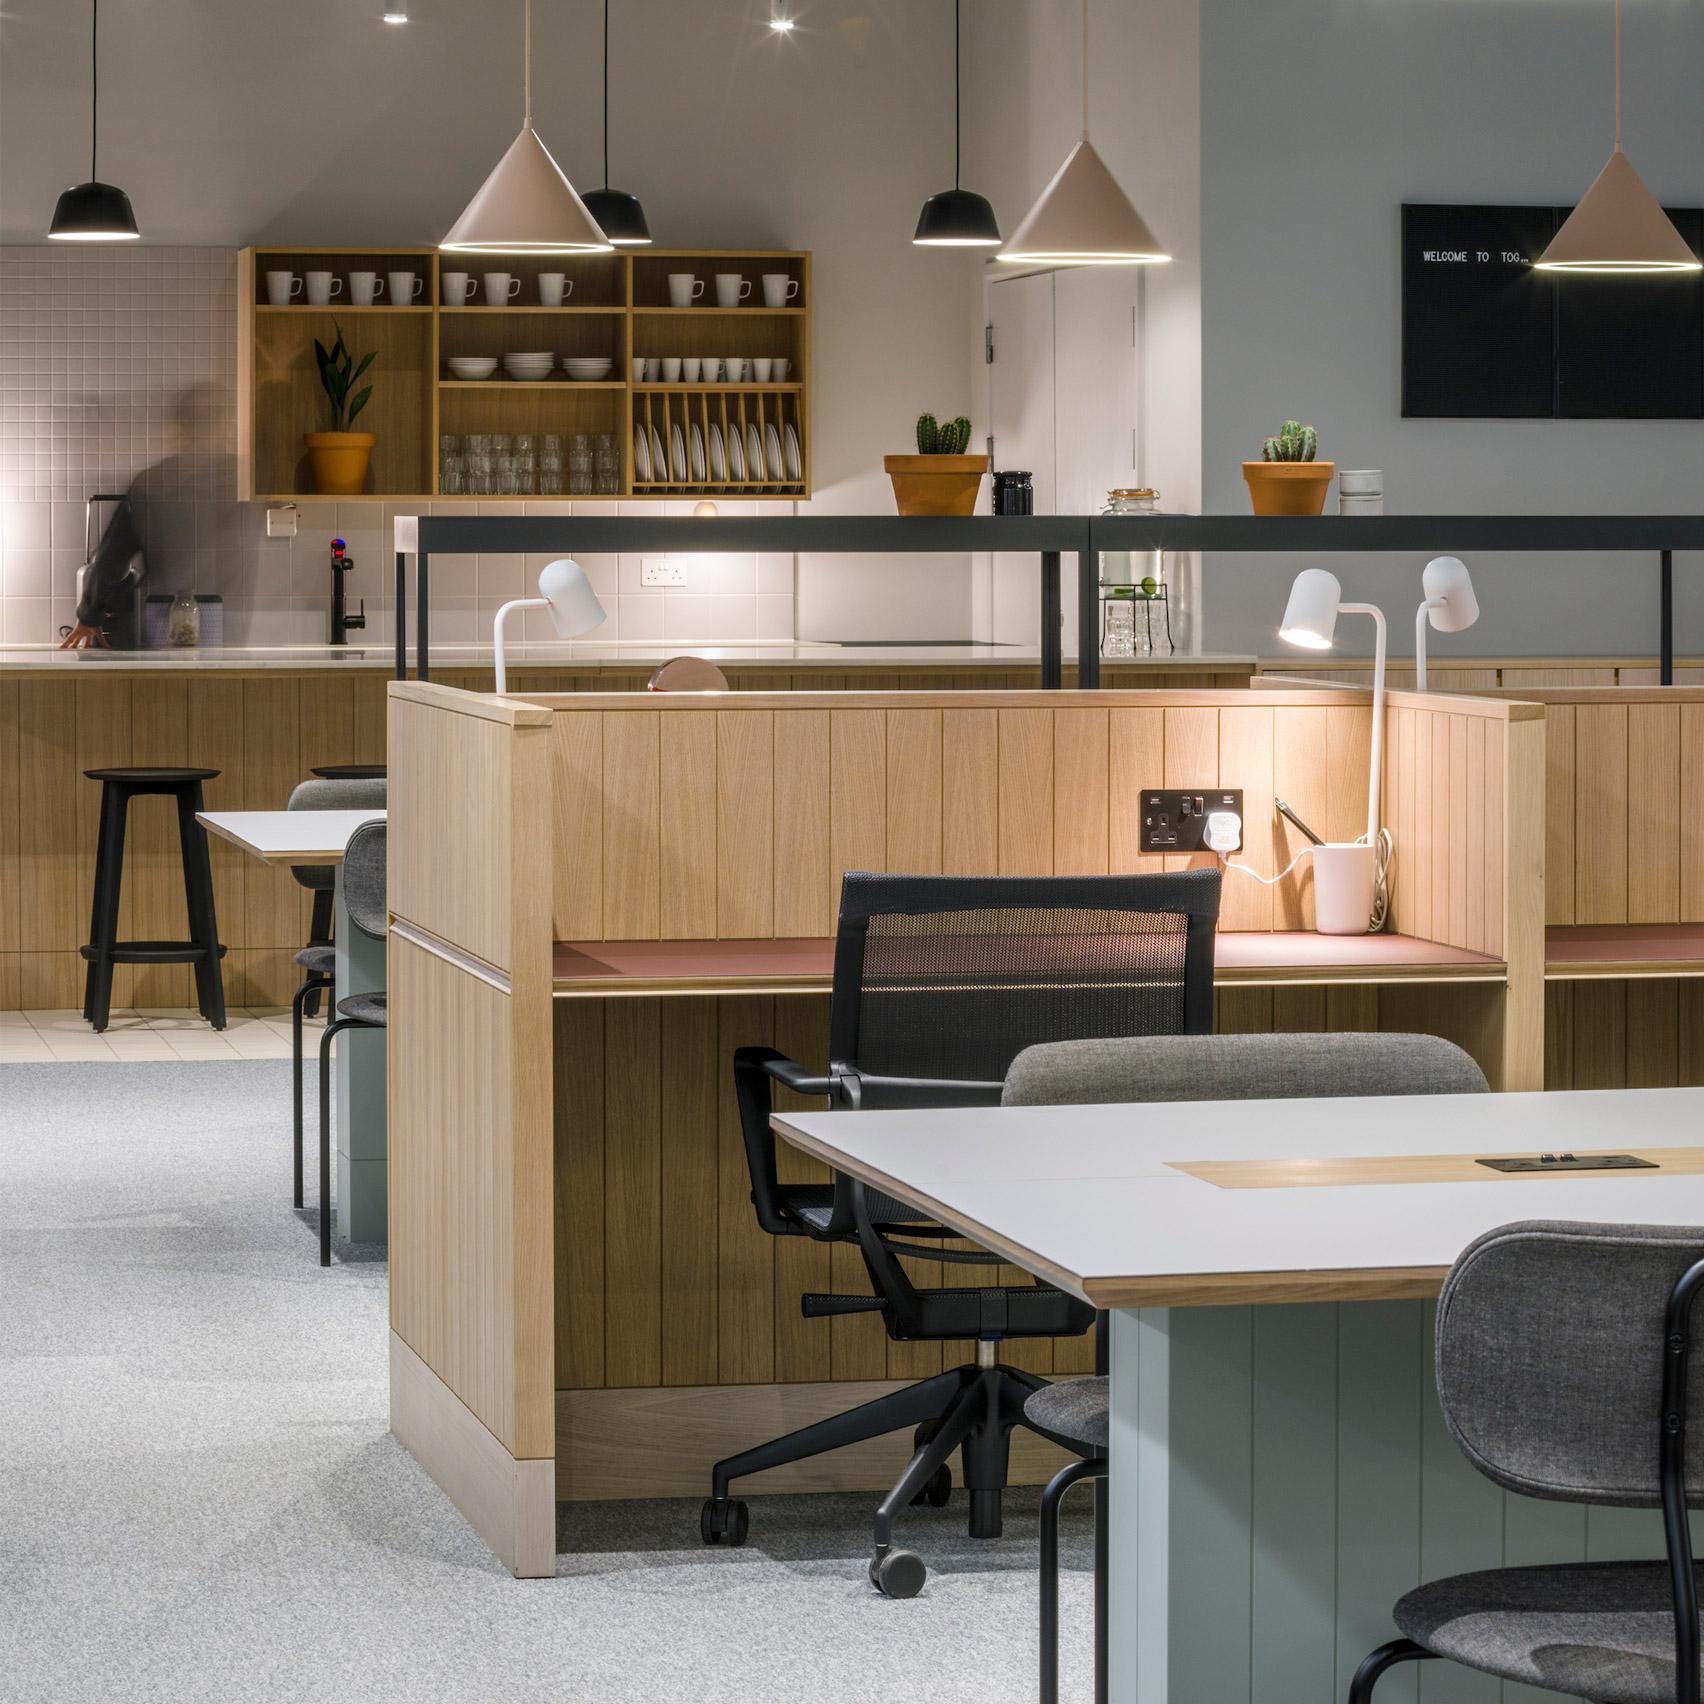 Top 10 office interiors: Thomas House, UK by SODA